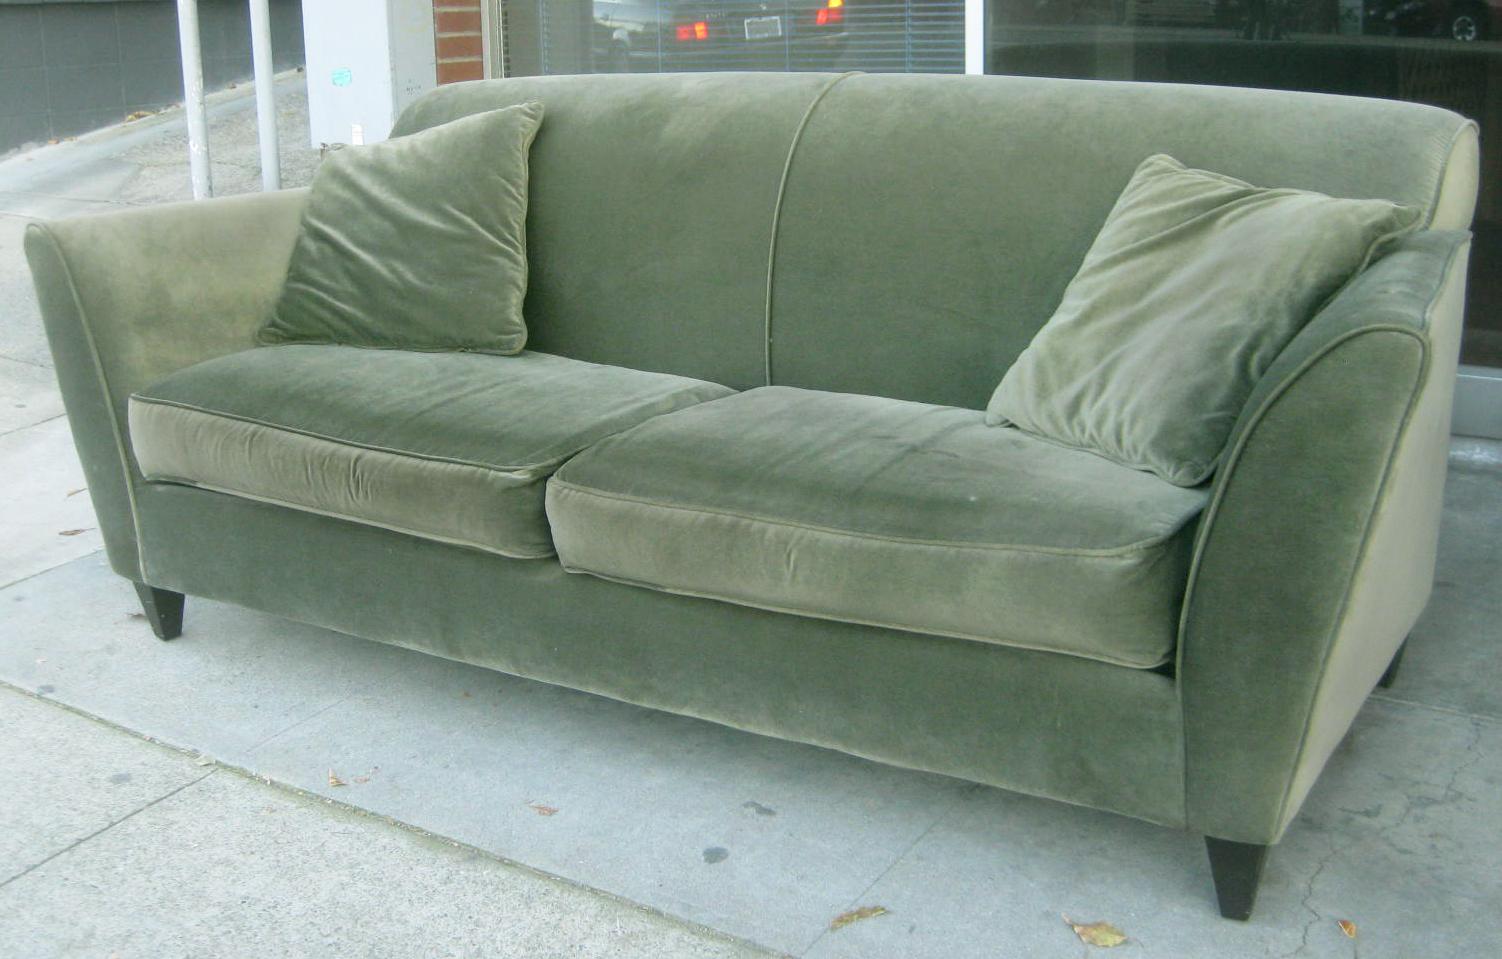 Uhuru Furniture Amp Collectibles Sold Olive Sofa 95